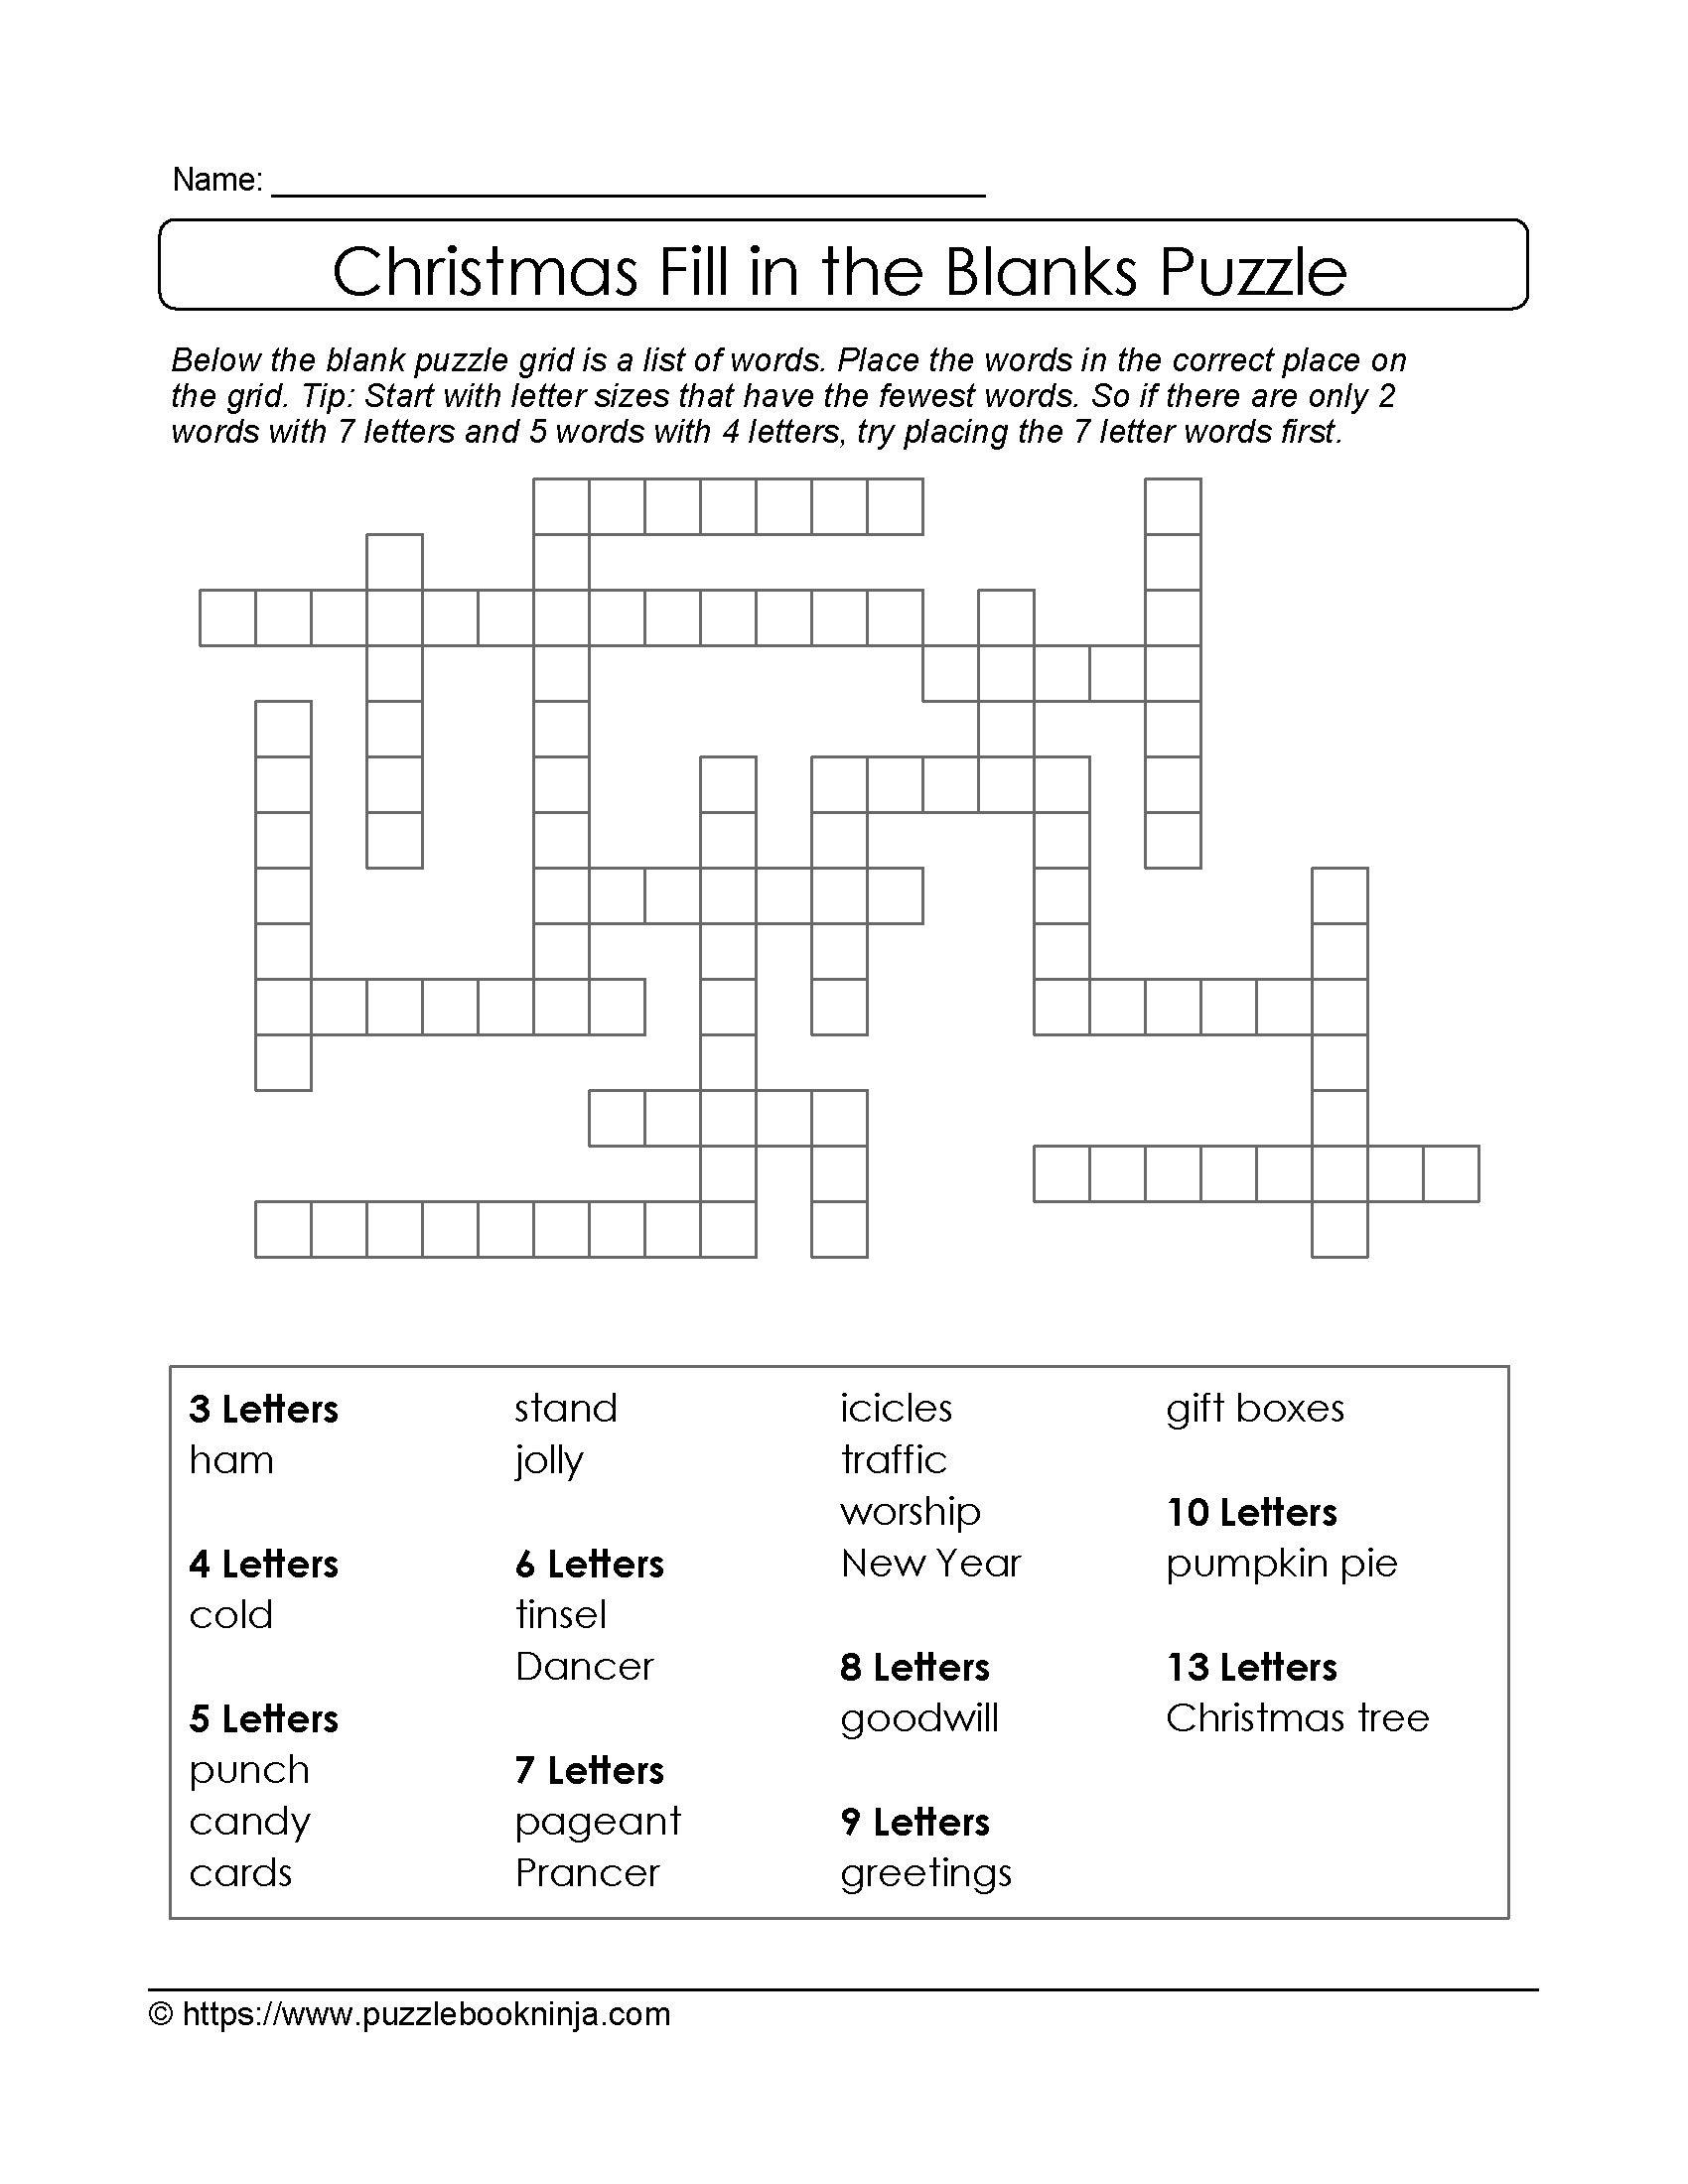 Freebie Xmas Puzzle To Print. Fill In The Blanks Crossword Like - Printable Blank Crossword Grid